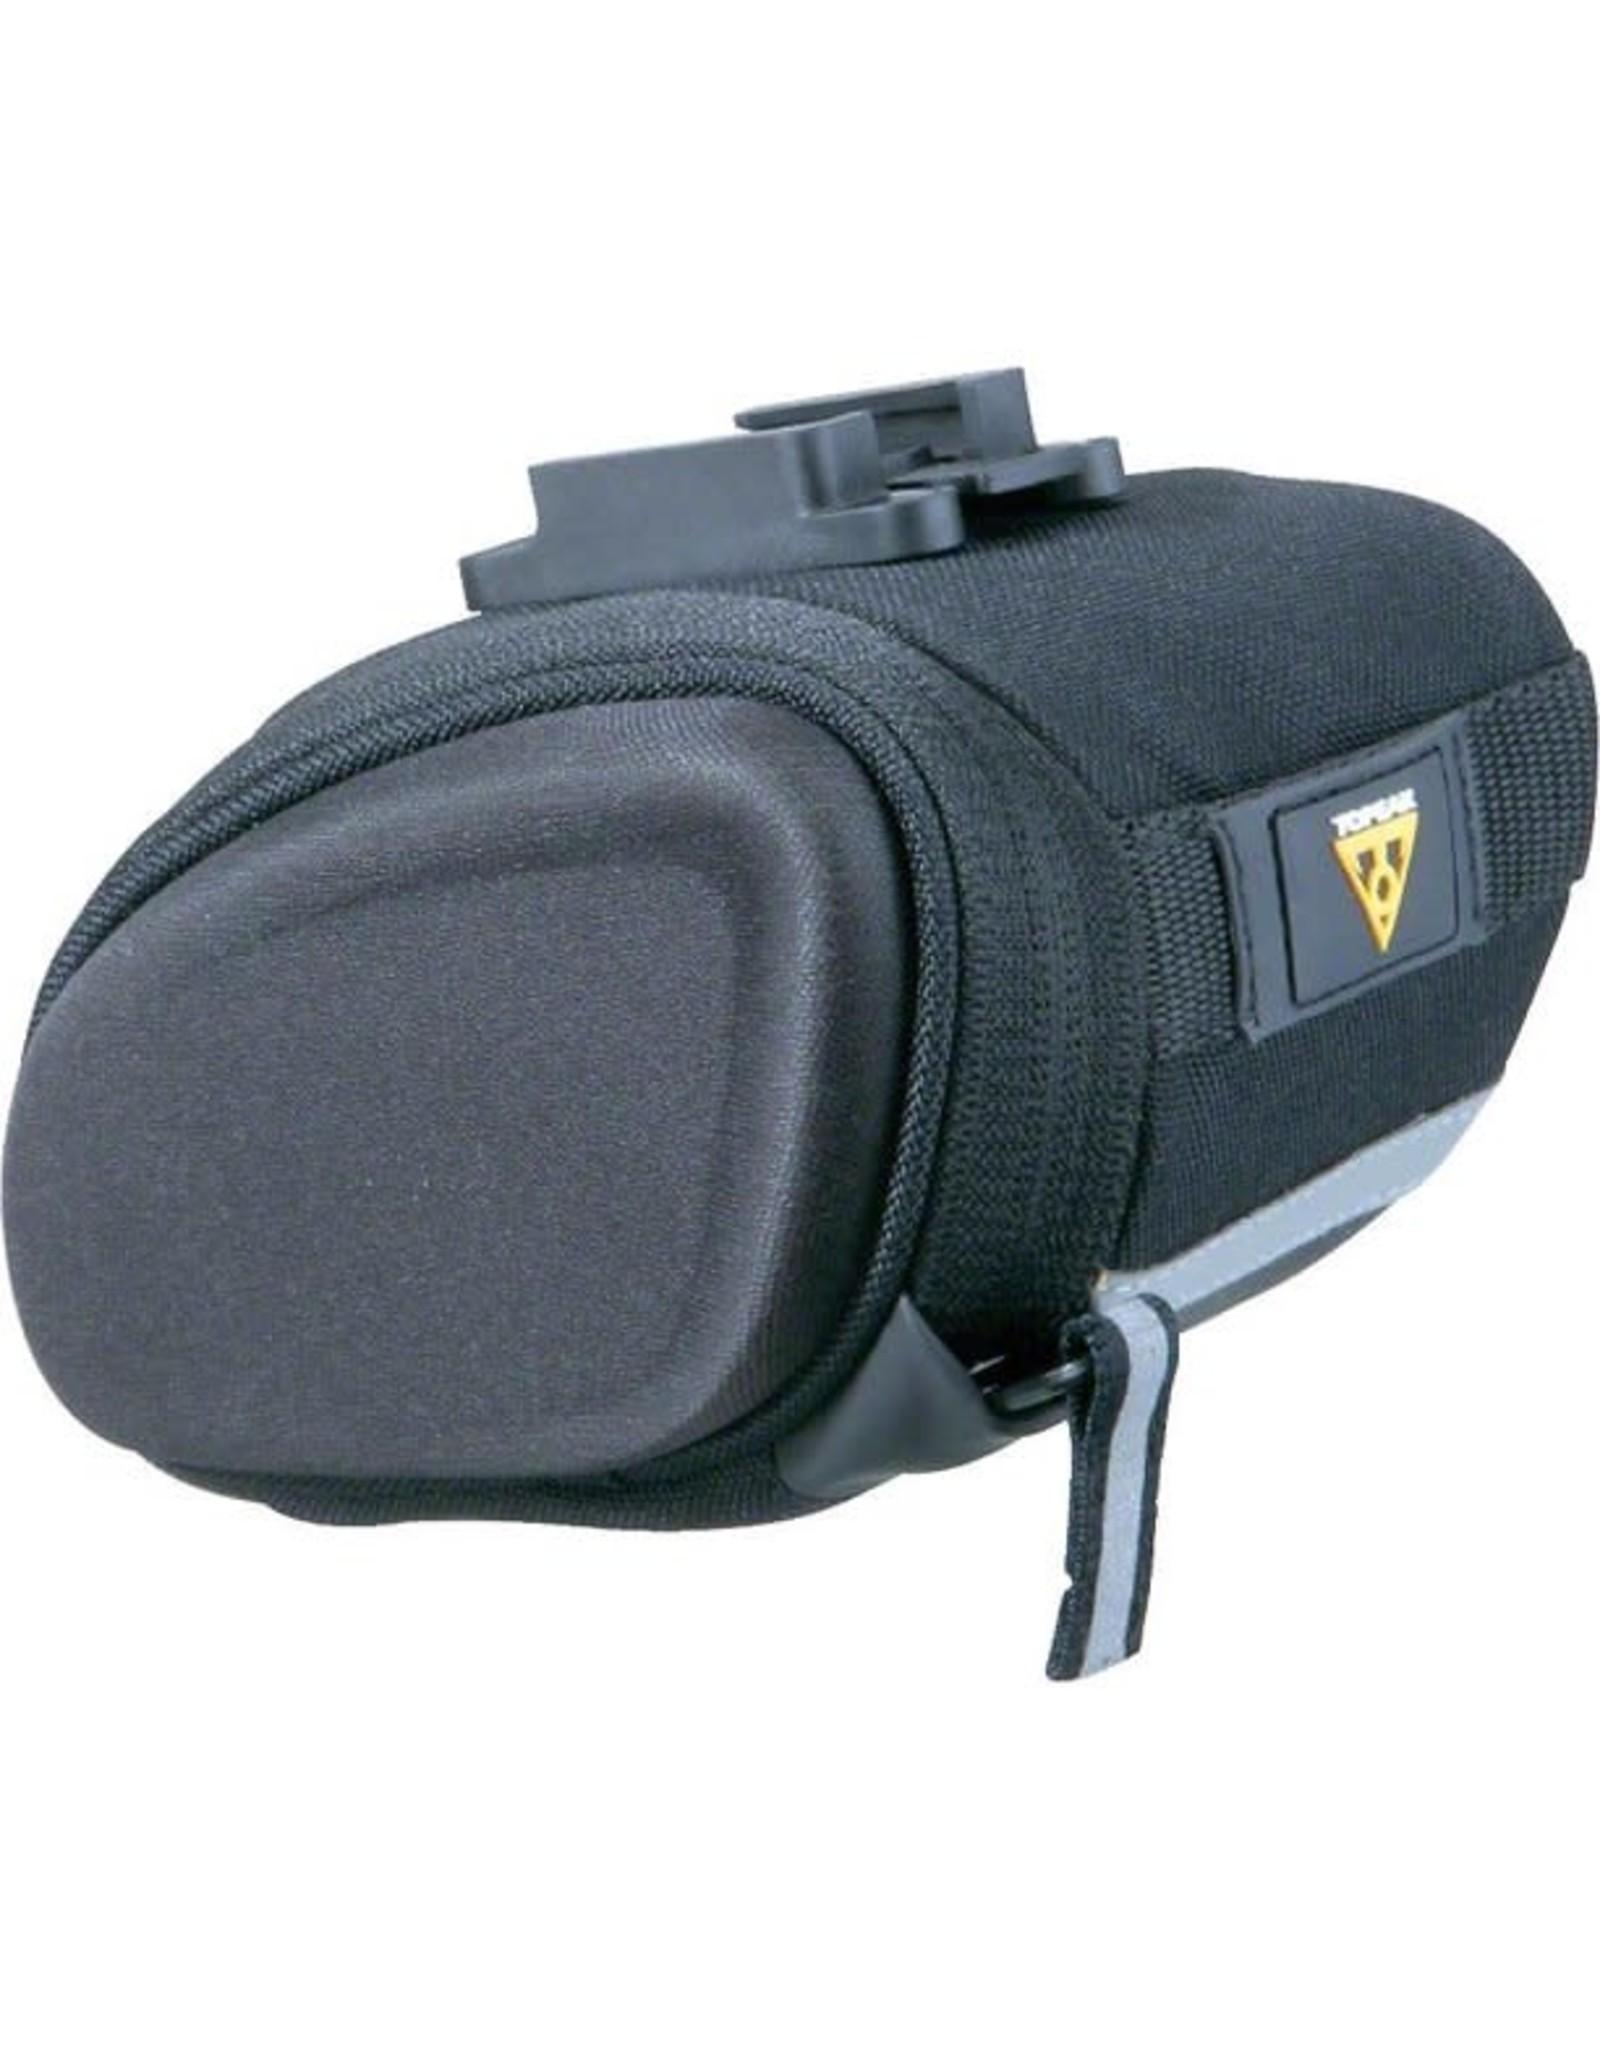 Topeak Bag Topeak SideKick Wedge Seat Bag Medium, Black